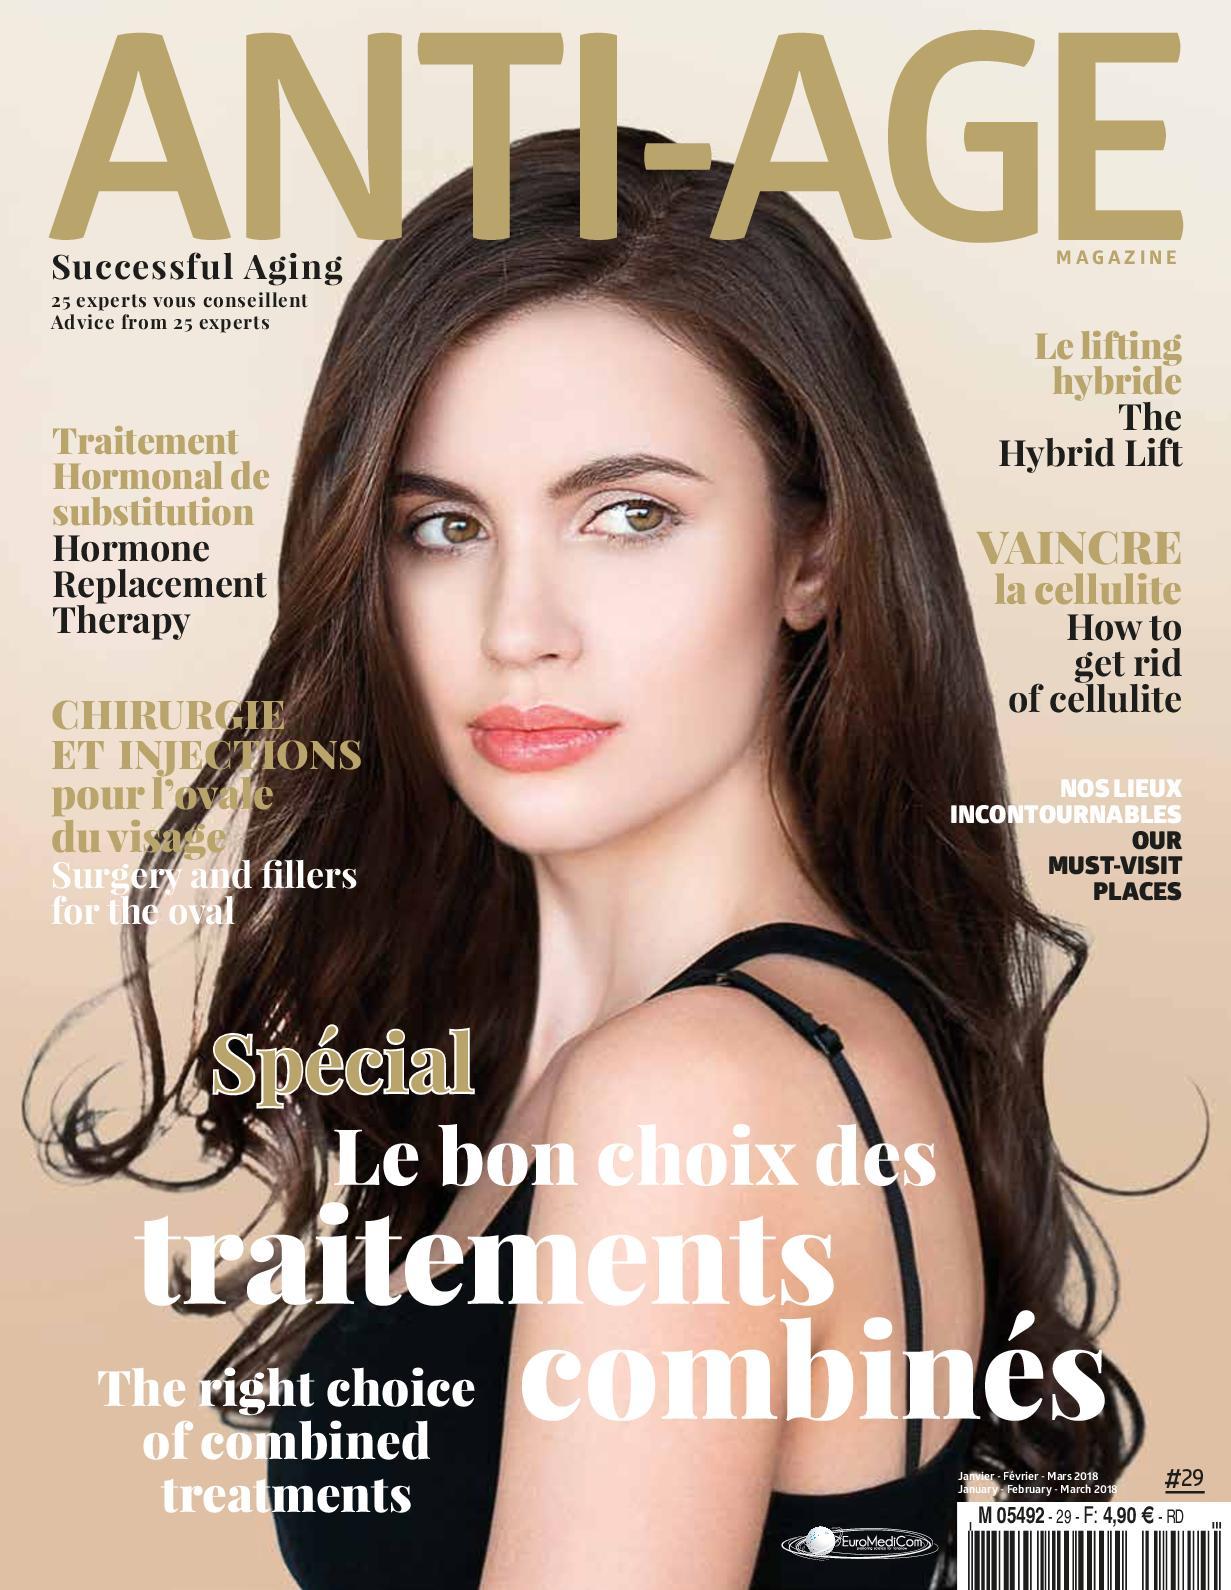 ANTI-AGE Magazine #29